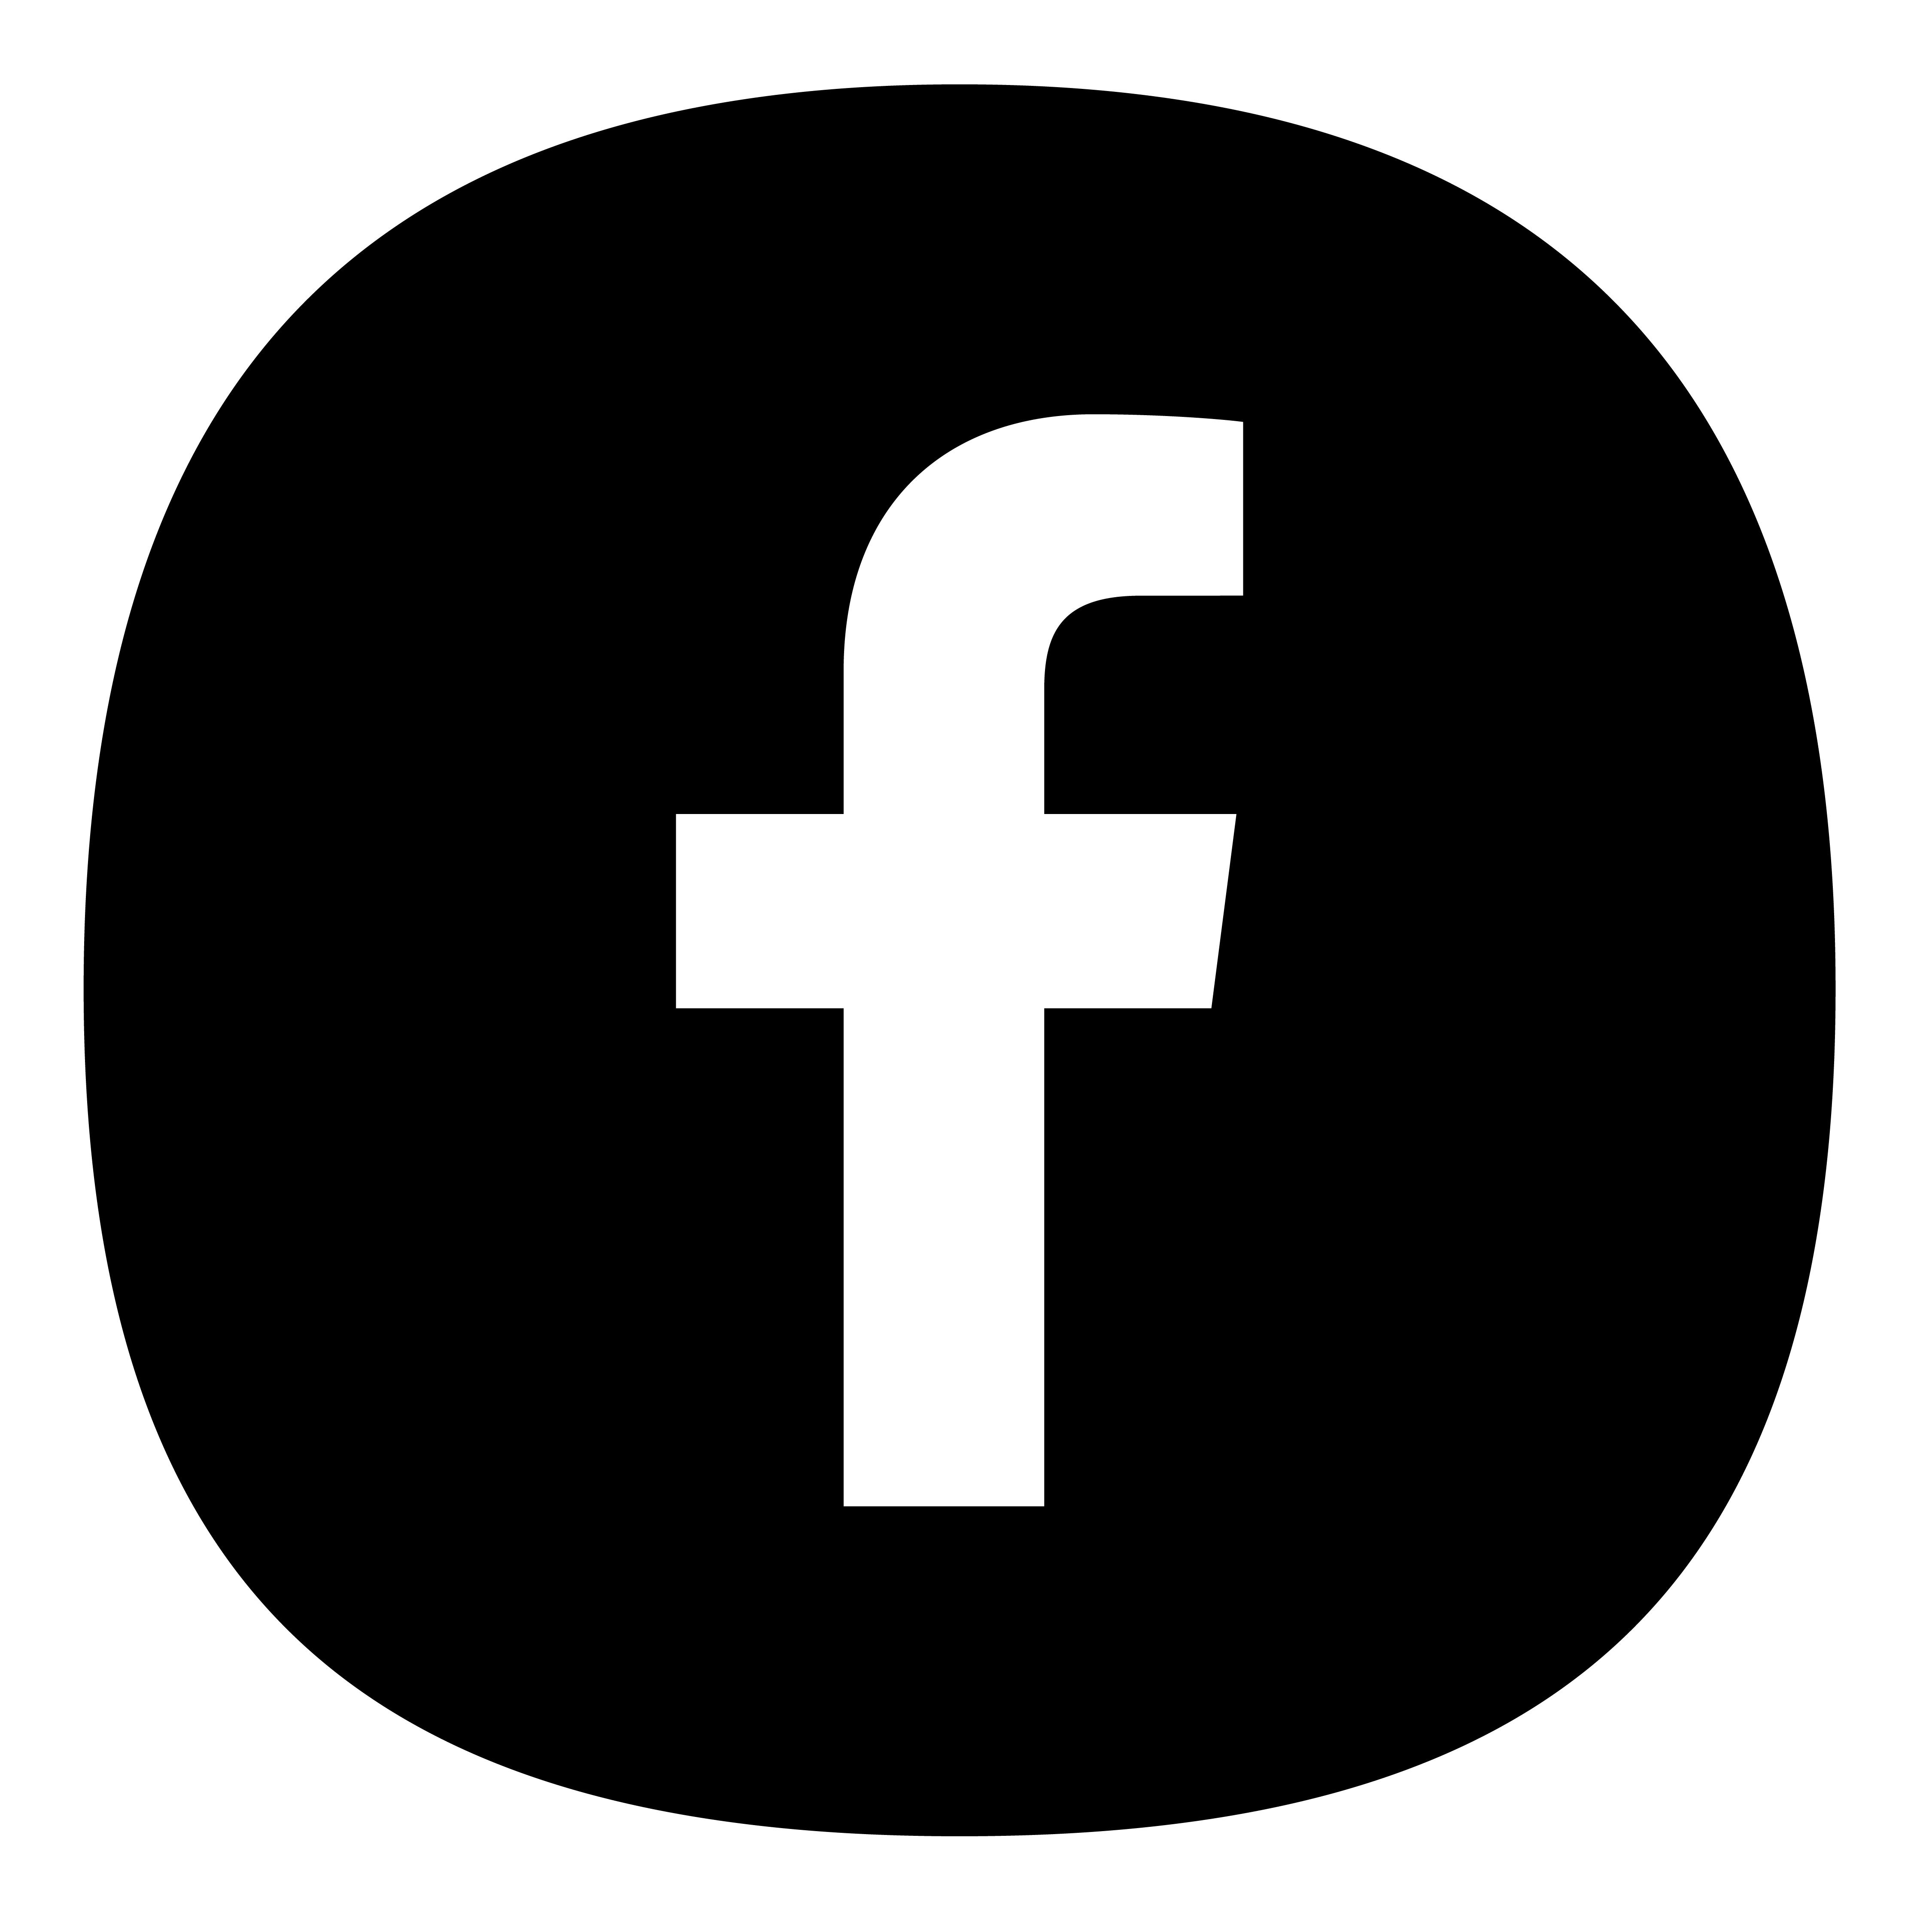 facebook-boca-dolza_Tavola disegno 1